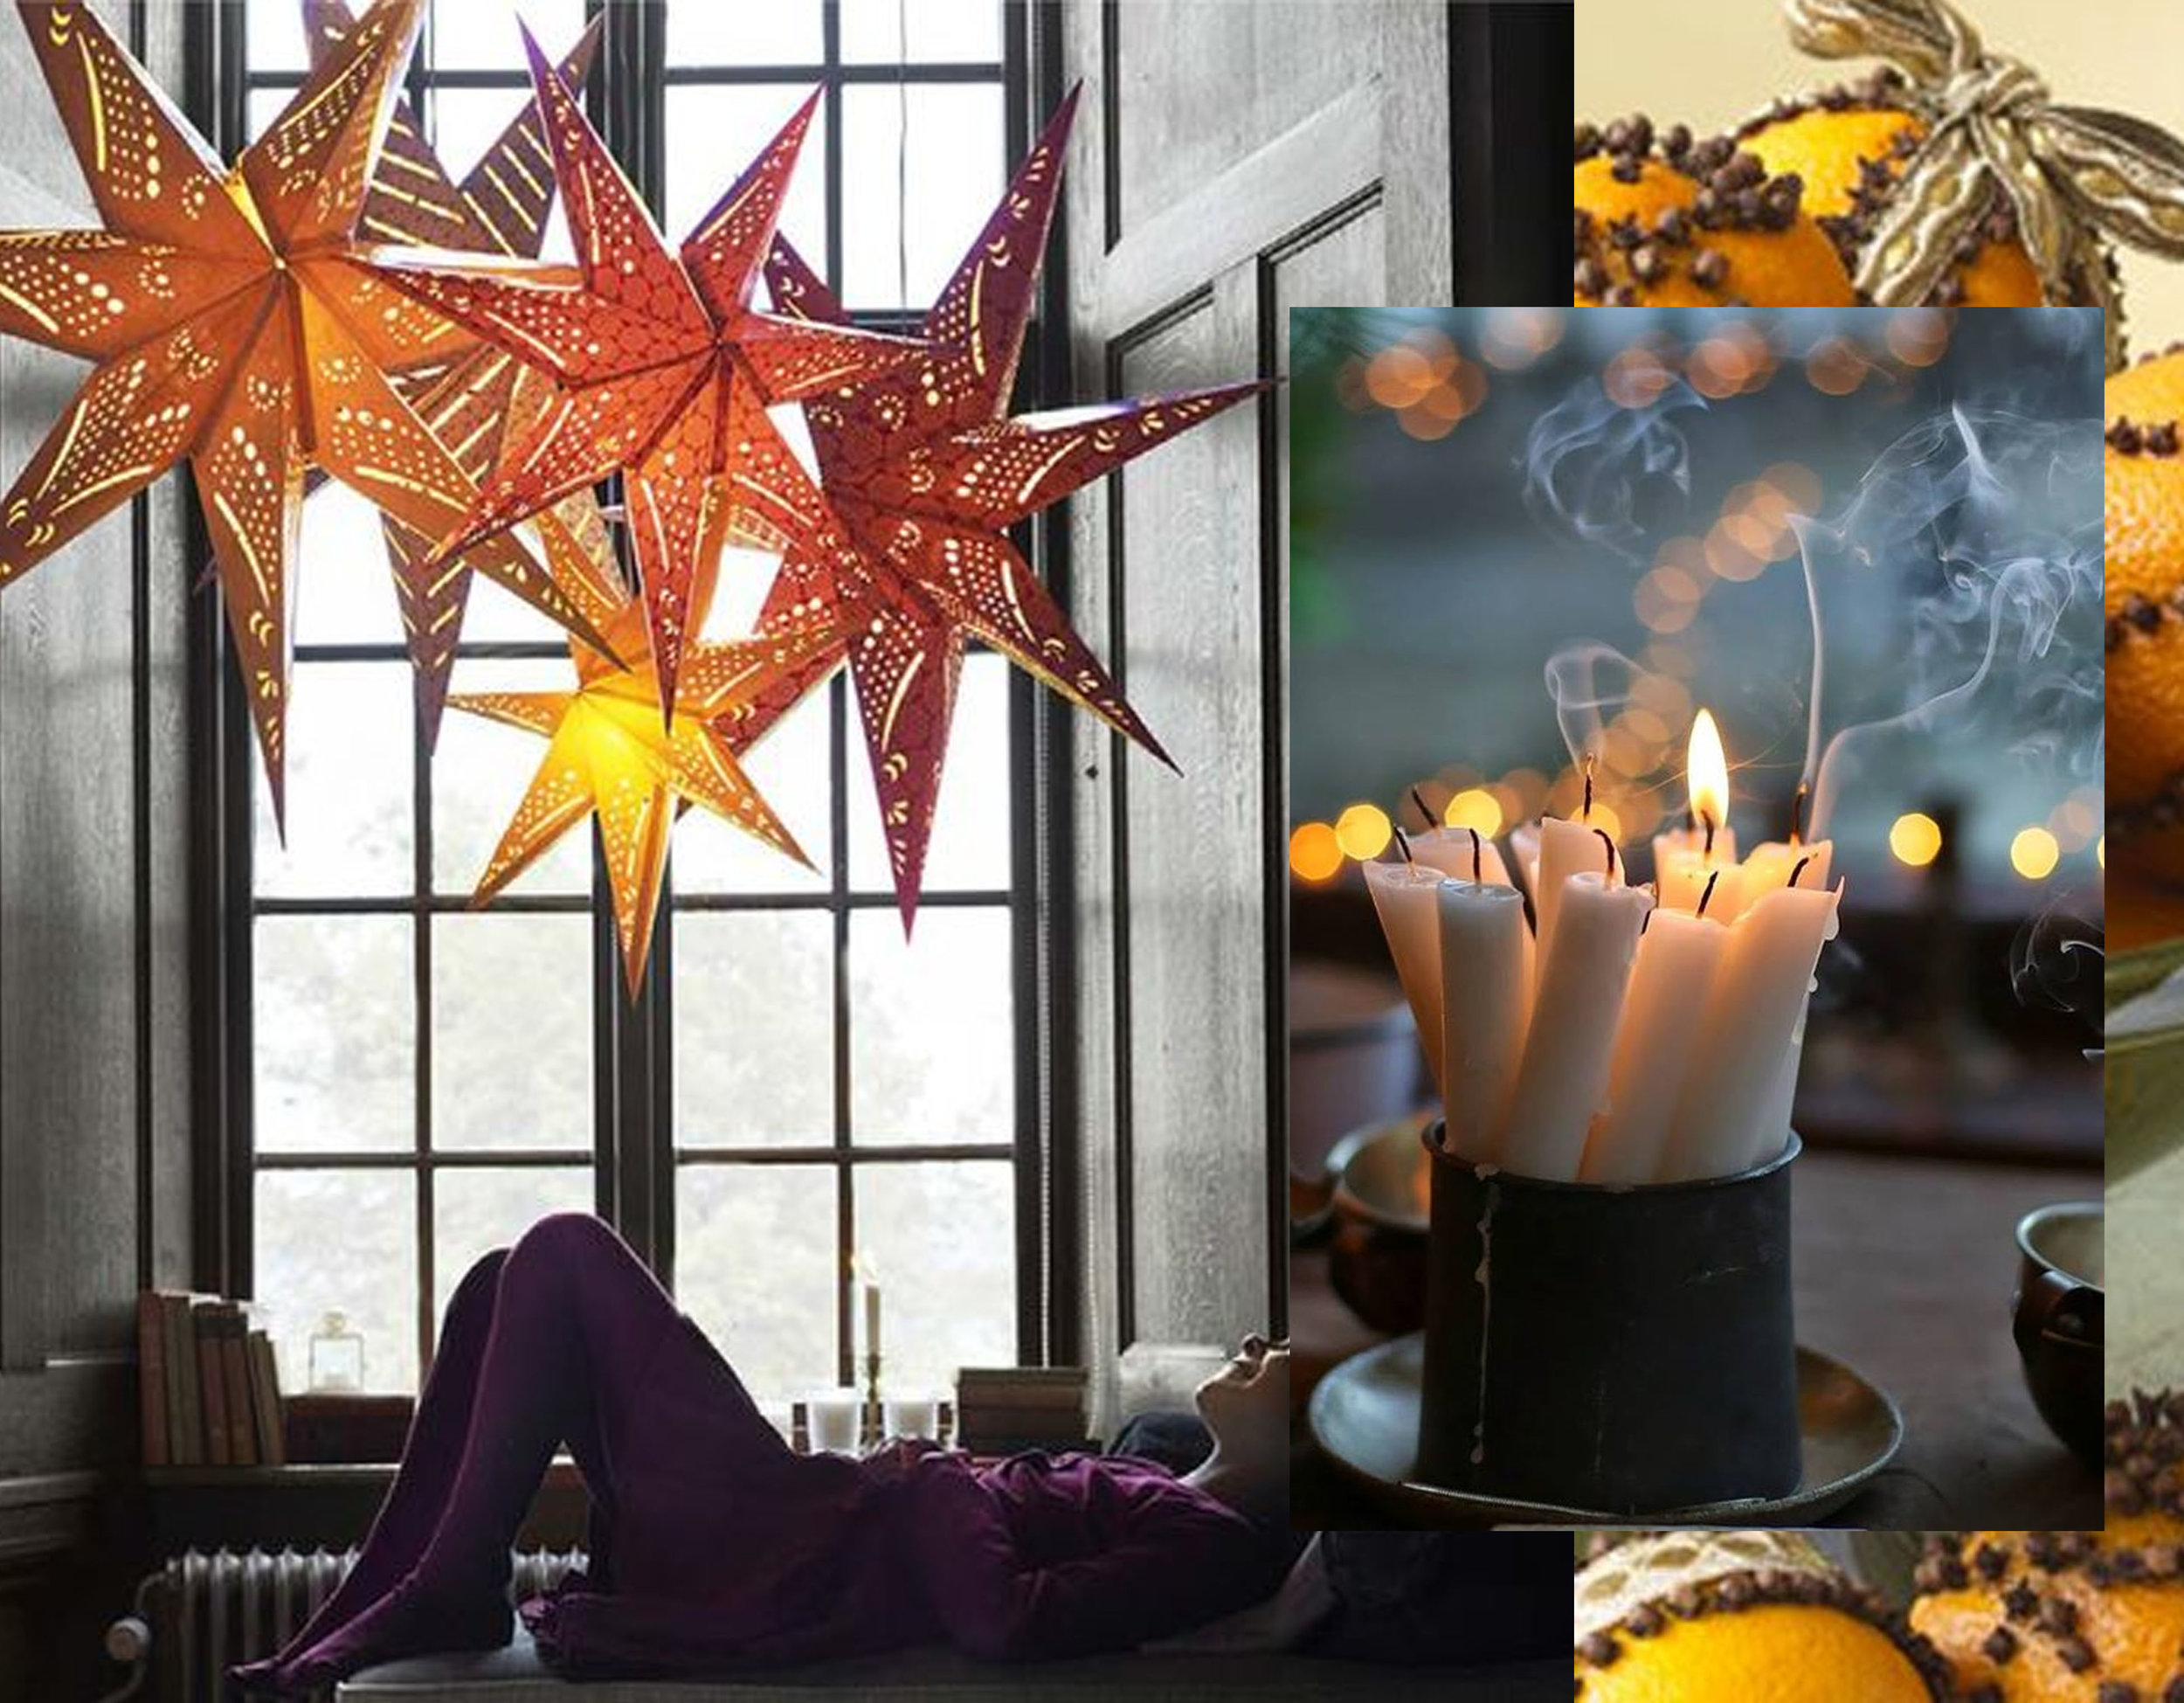 Strala pendant lamp  IKEA  - candles via  Hickory Flat  - oranges via Pinterest